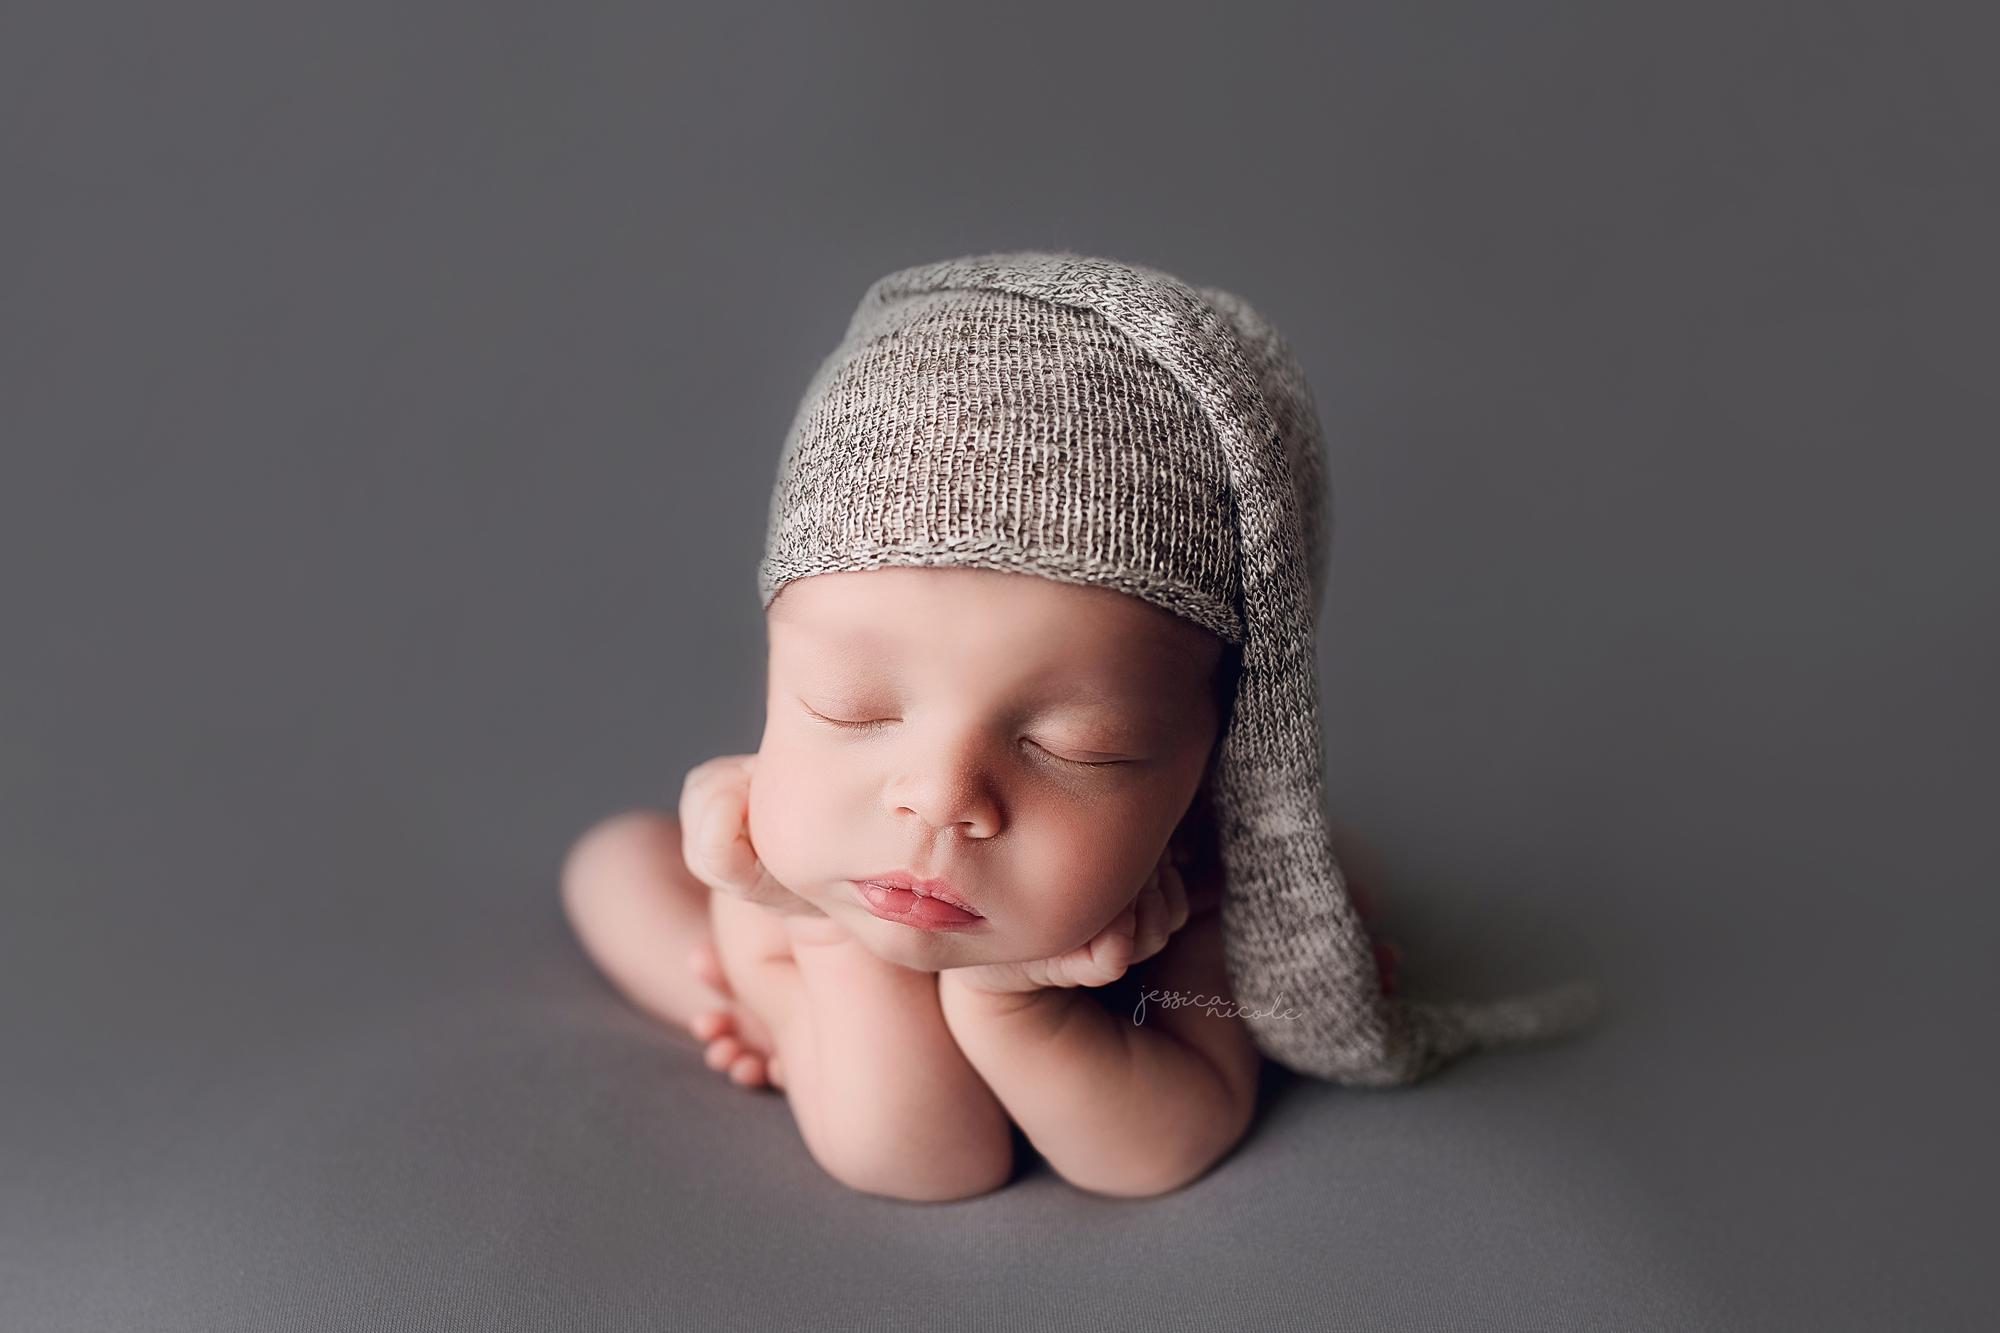 Beautiful baby l oshawa bowmanville whitby courtice ajax durham region gta newborn photographer